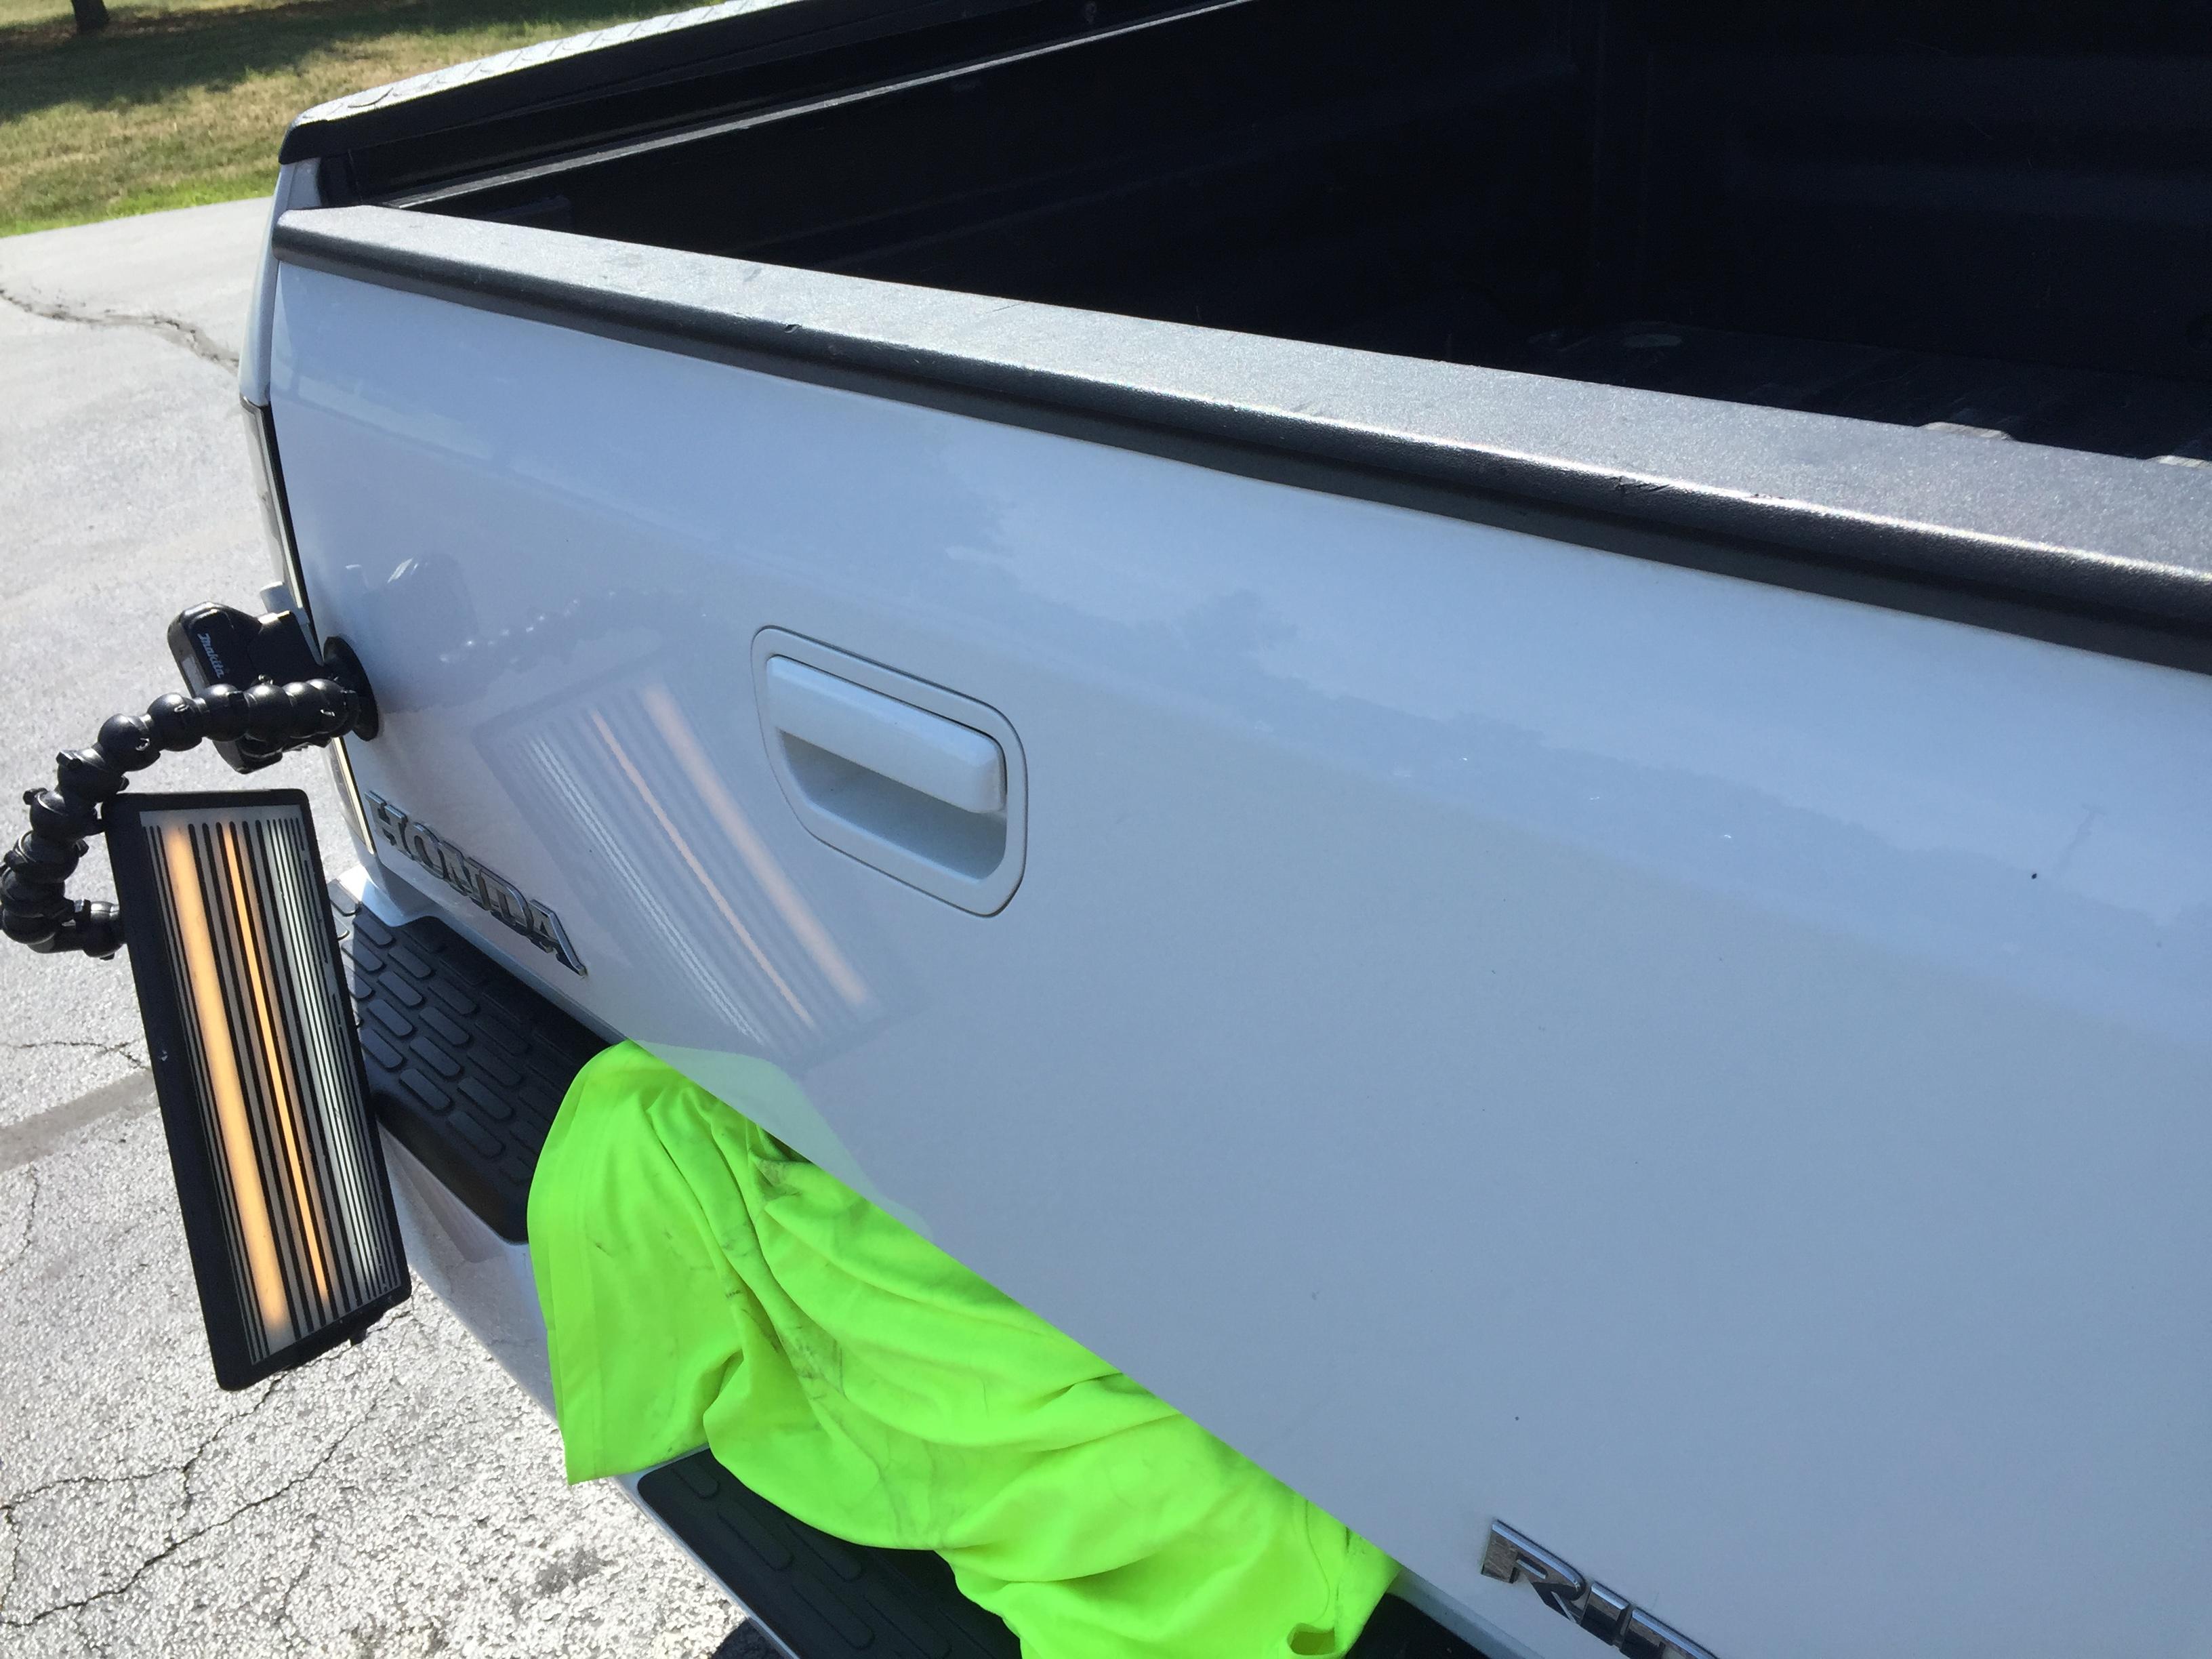 2008 Hond Ridgeline Dent Repair, Mobile Dent Repair, Springfield, IL Decatur, IL http://217dent.com